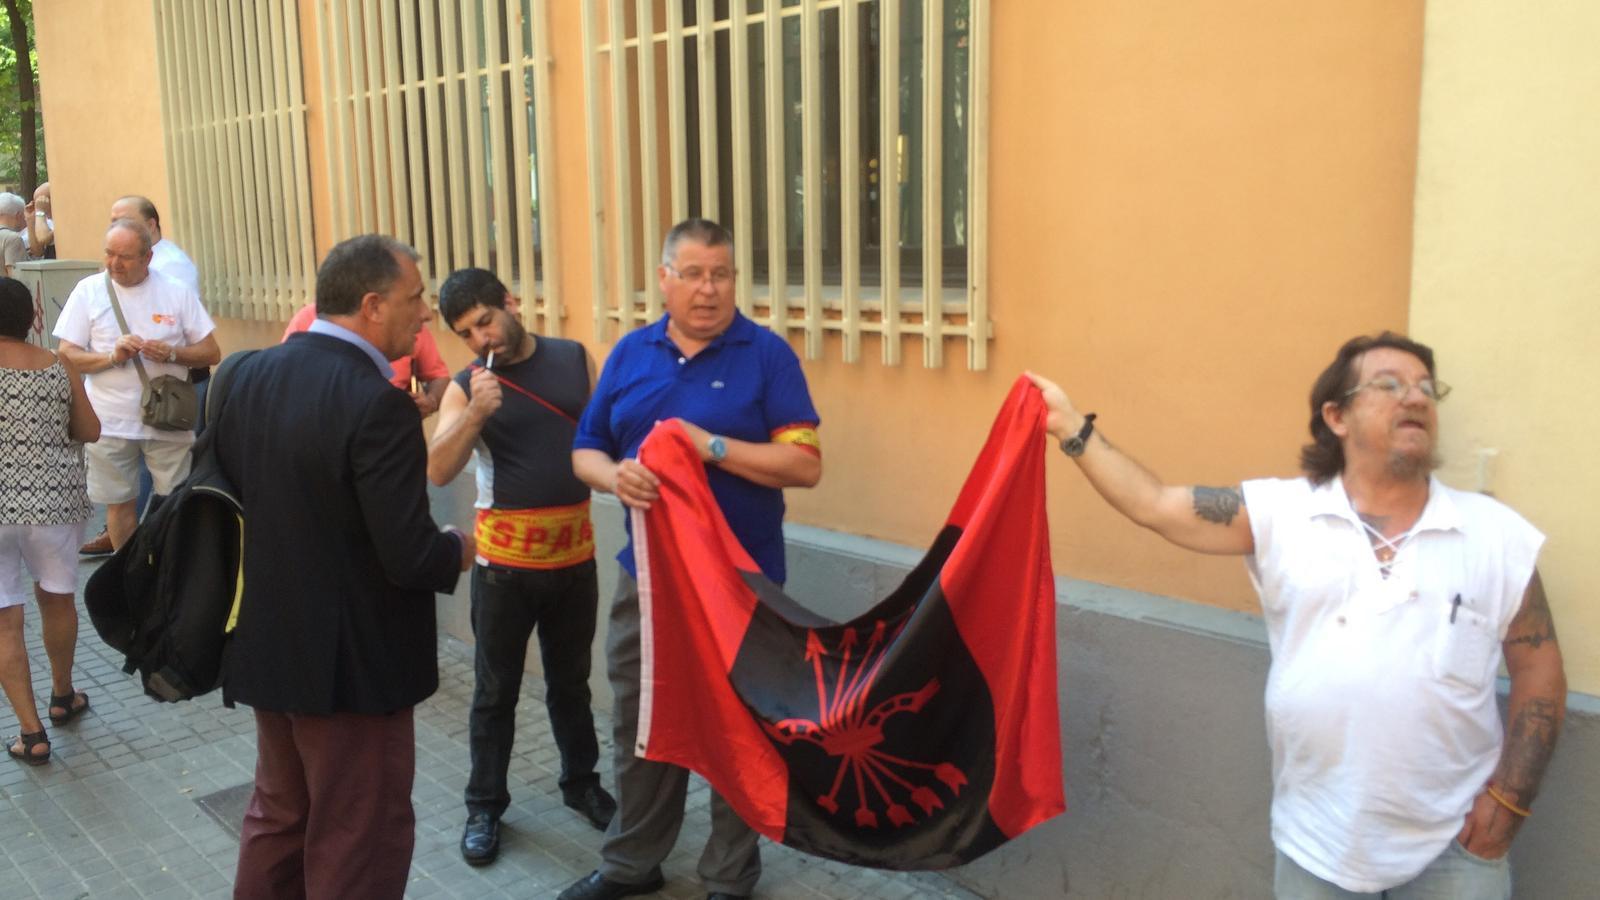 Manifestants-Falange-mobilitzacio-Guardia-Civil_1842425857_45897332_540x306.jpg